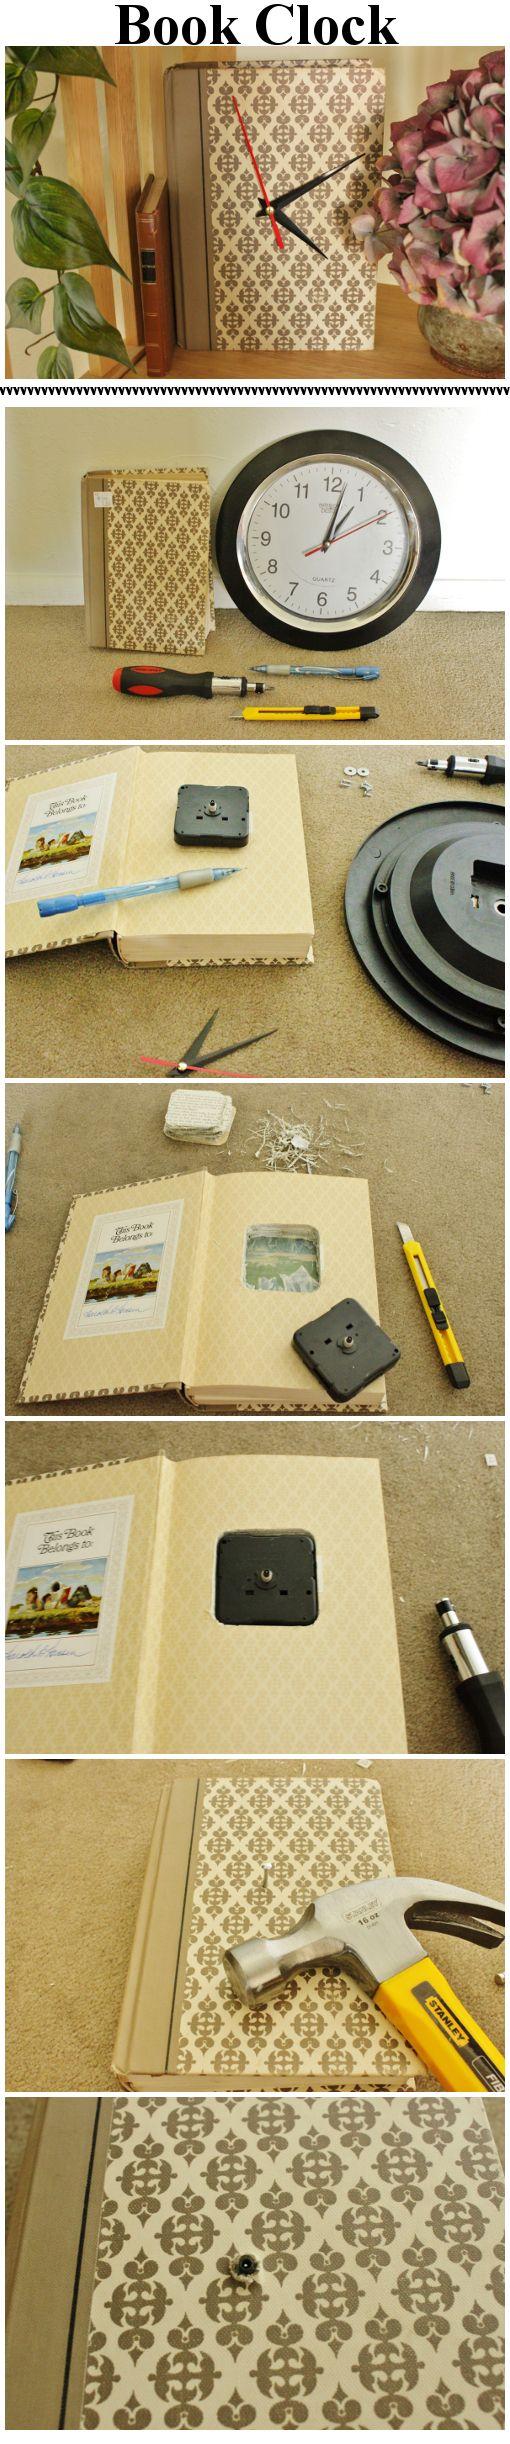 Dollar Store clock and DI book combine into a custom DIY clock for $2